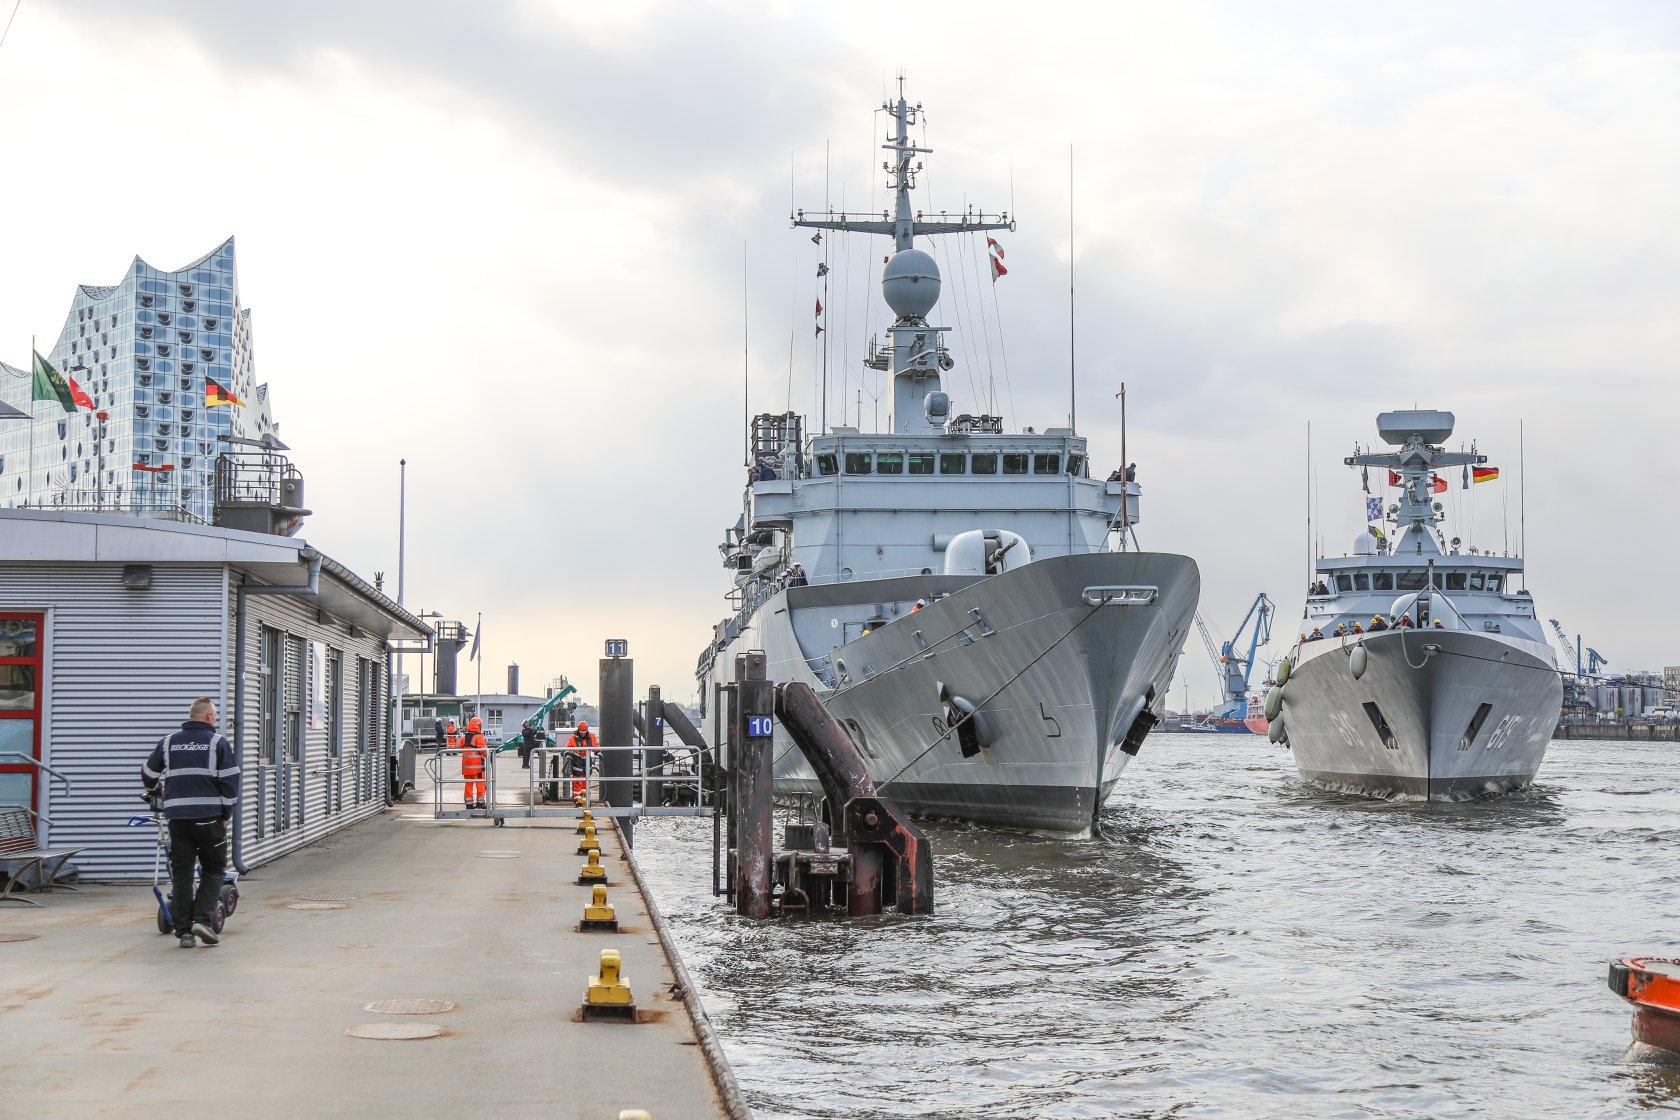 Royal Moroccan Navy Sigma class frigates / Frégates marocaines multimissions Sigma - Page 25 33717684628_701da7a65e_o